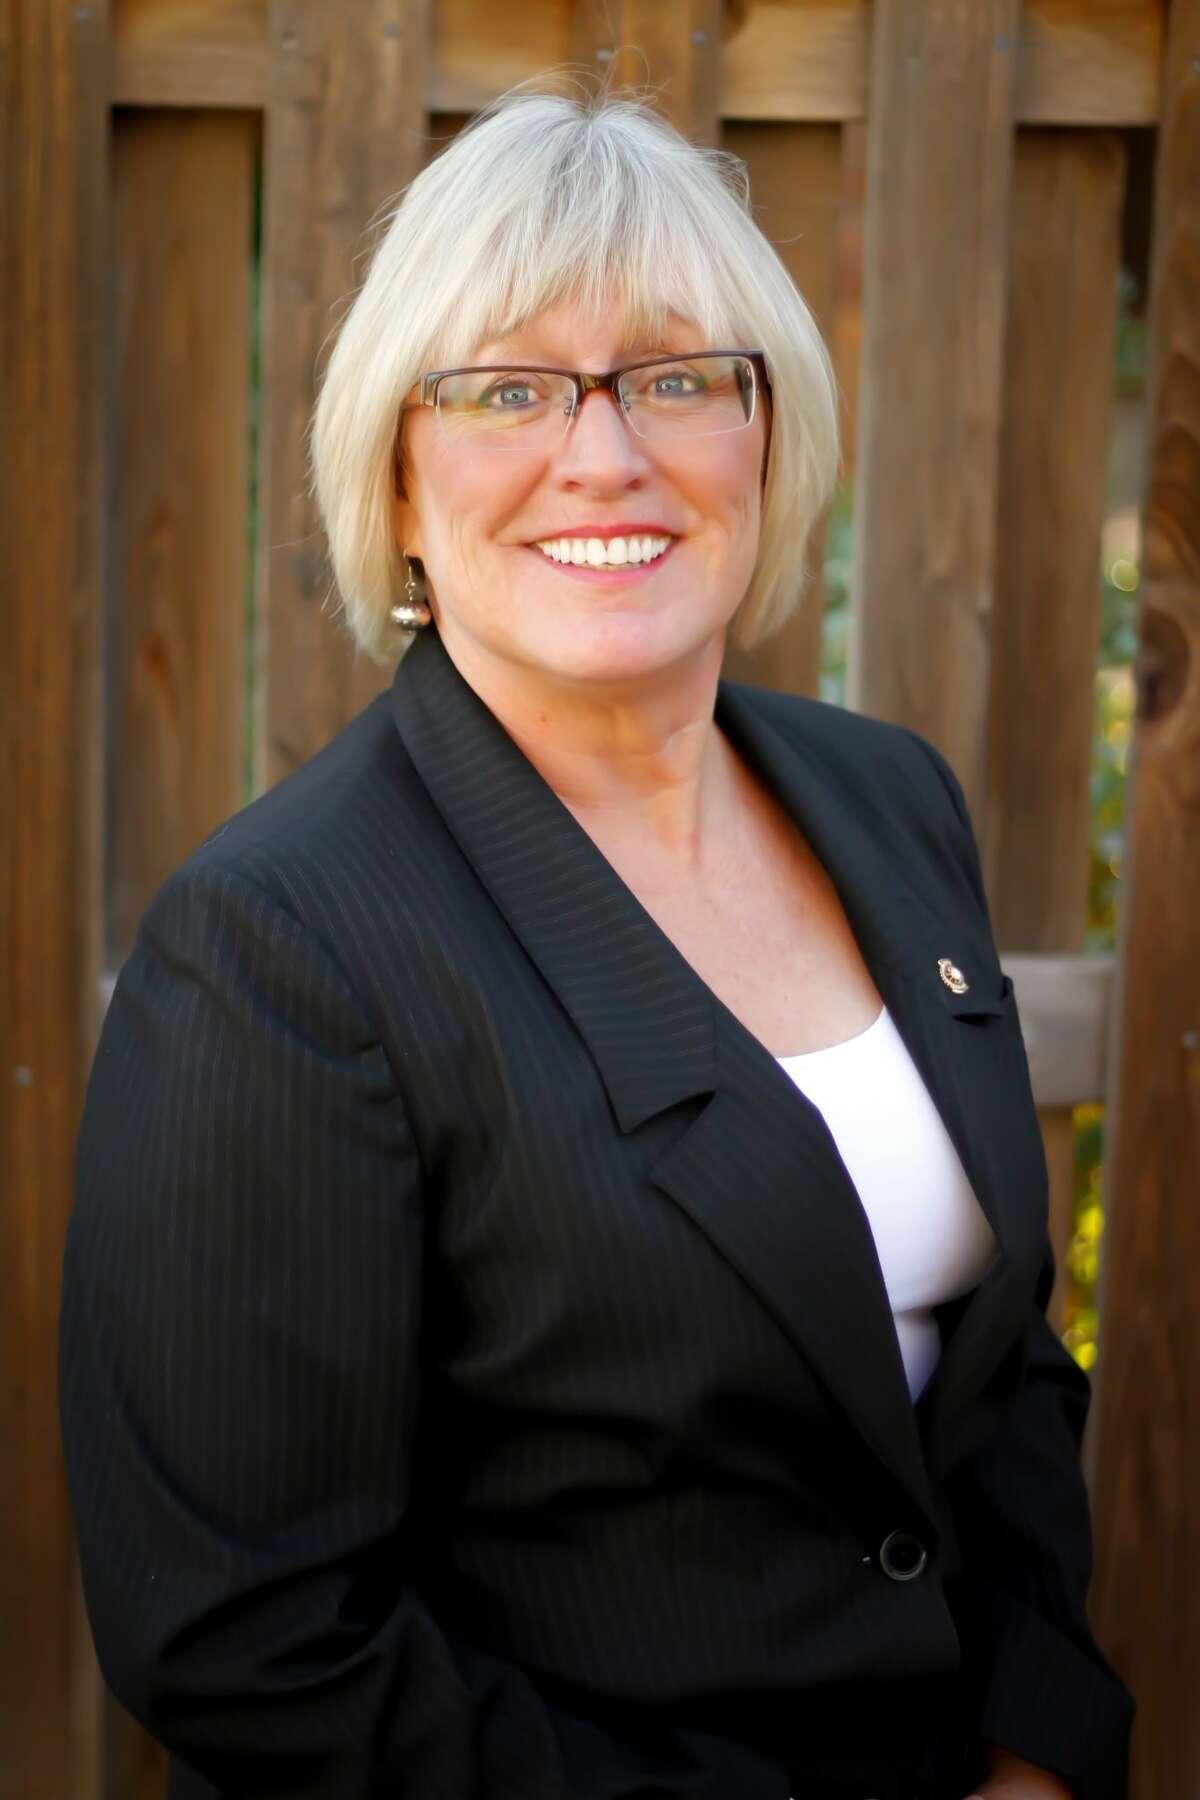 Charlotte Bosecker Executive director, MARC